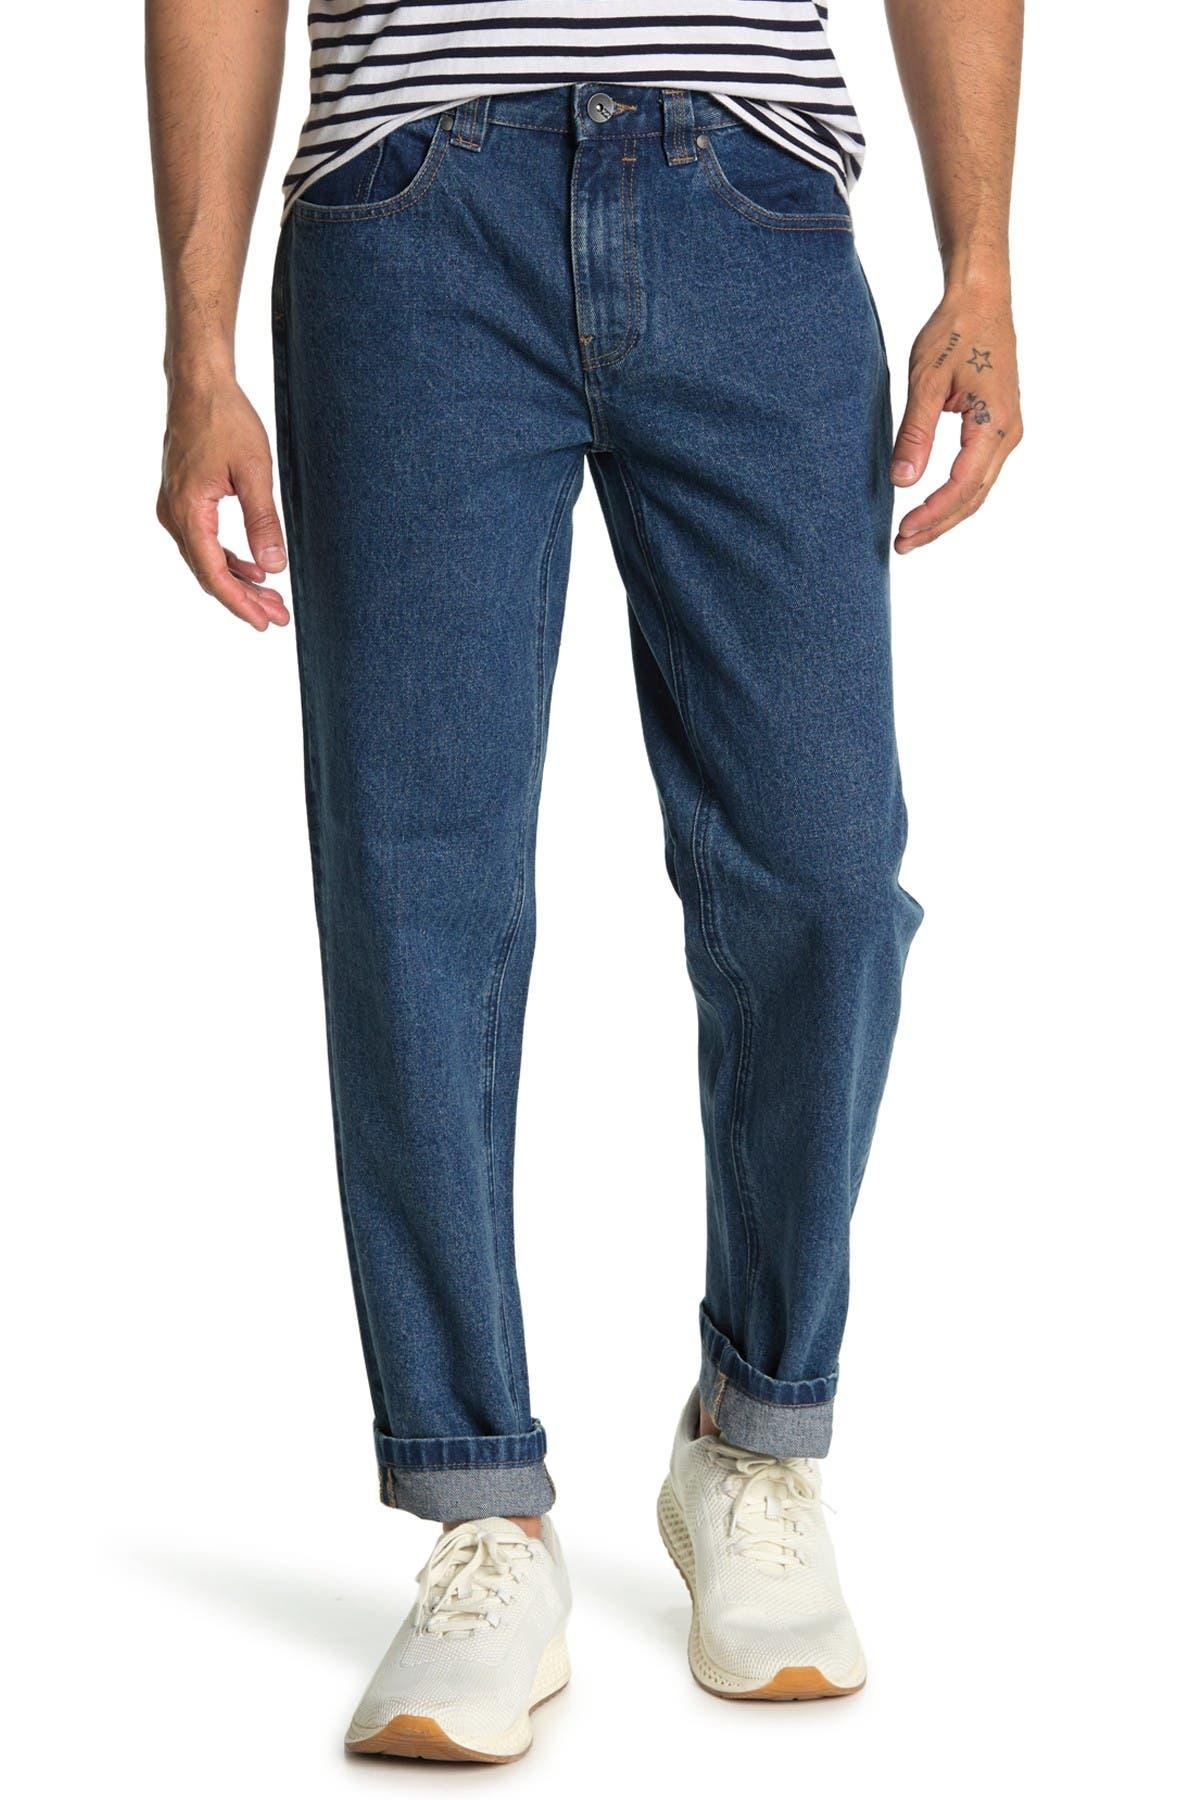 Image of Billabong Fifty Regular Fit Jean